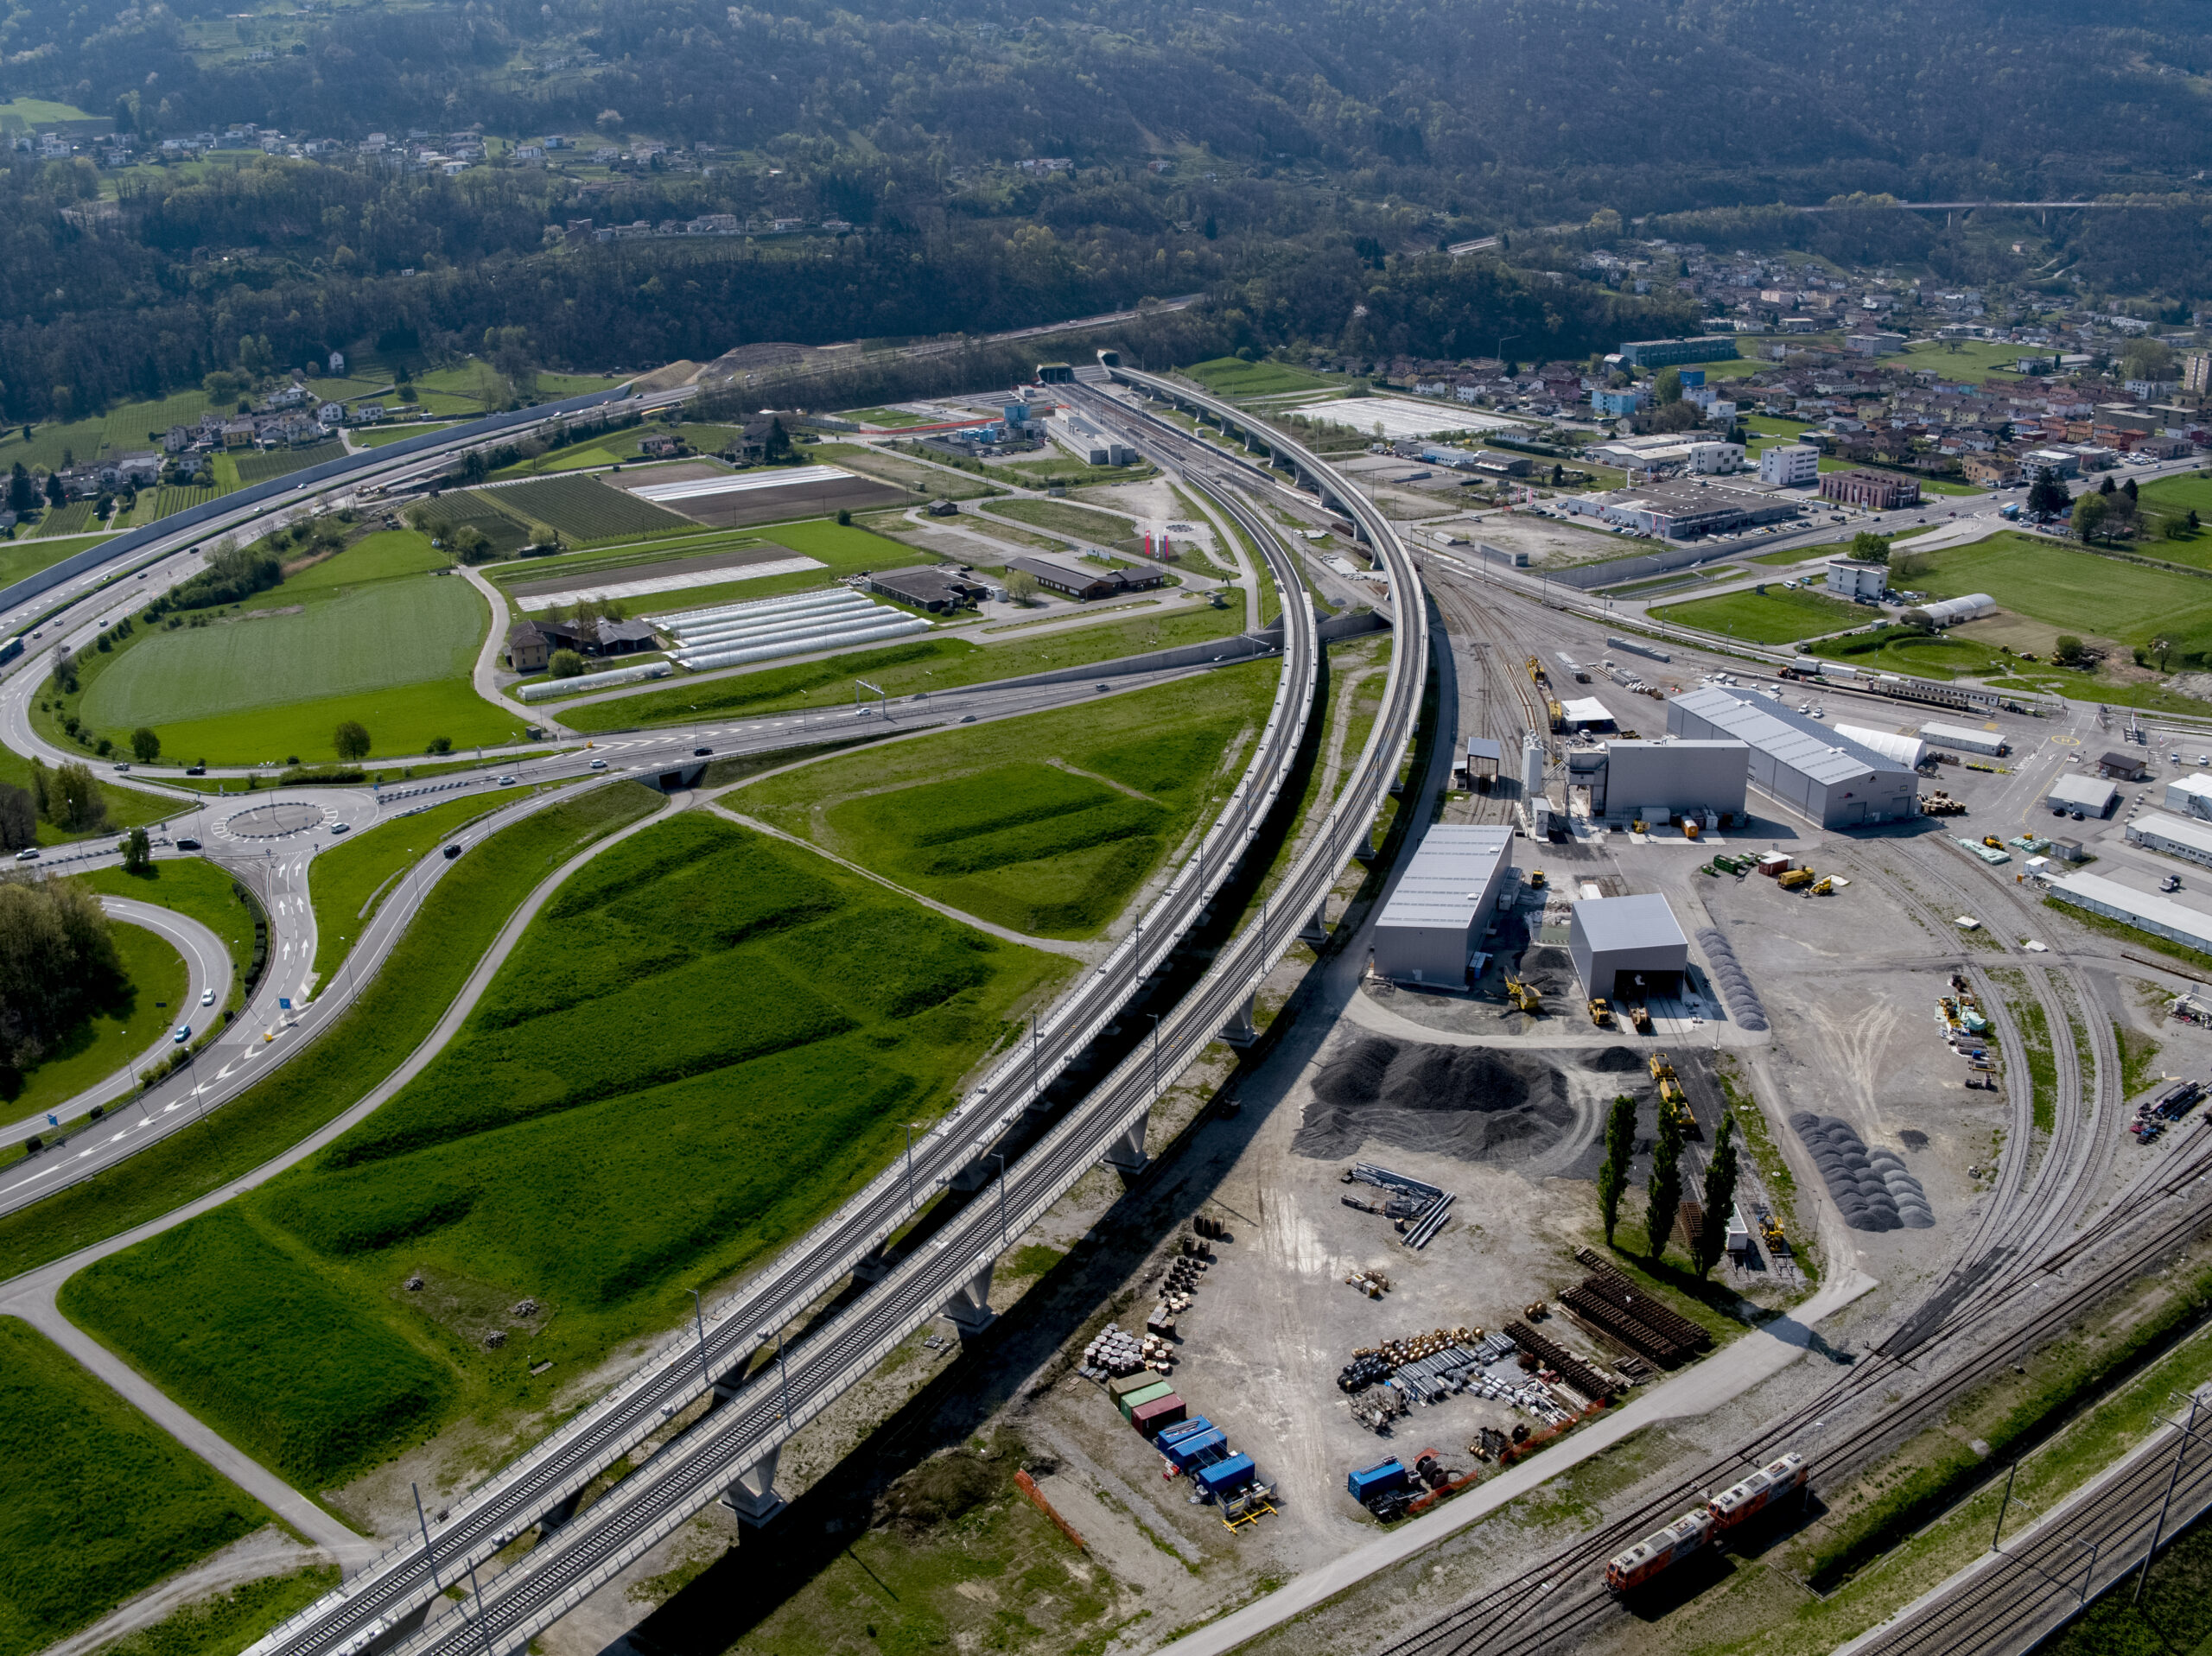 Aerial view Ceneri Base Tunnel